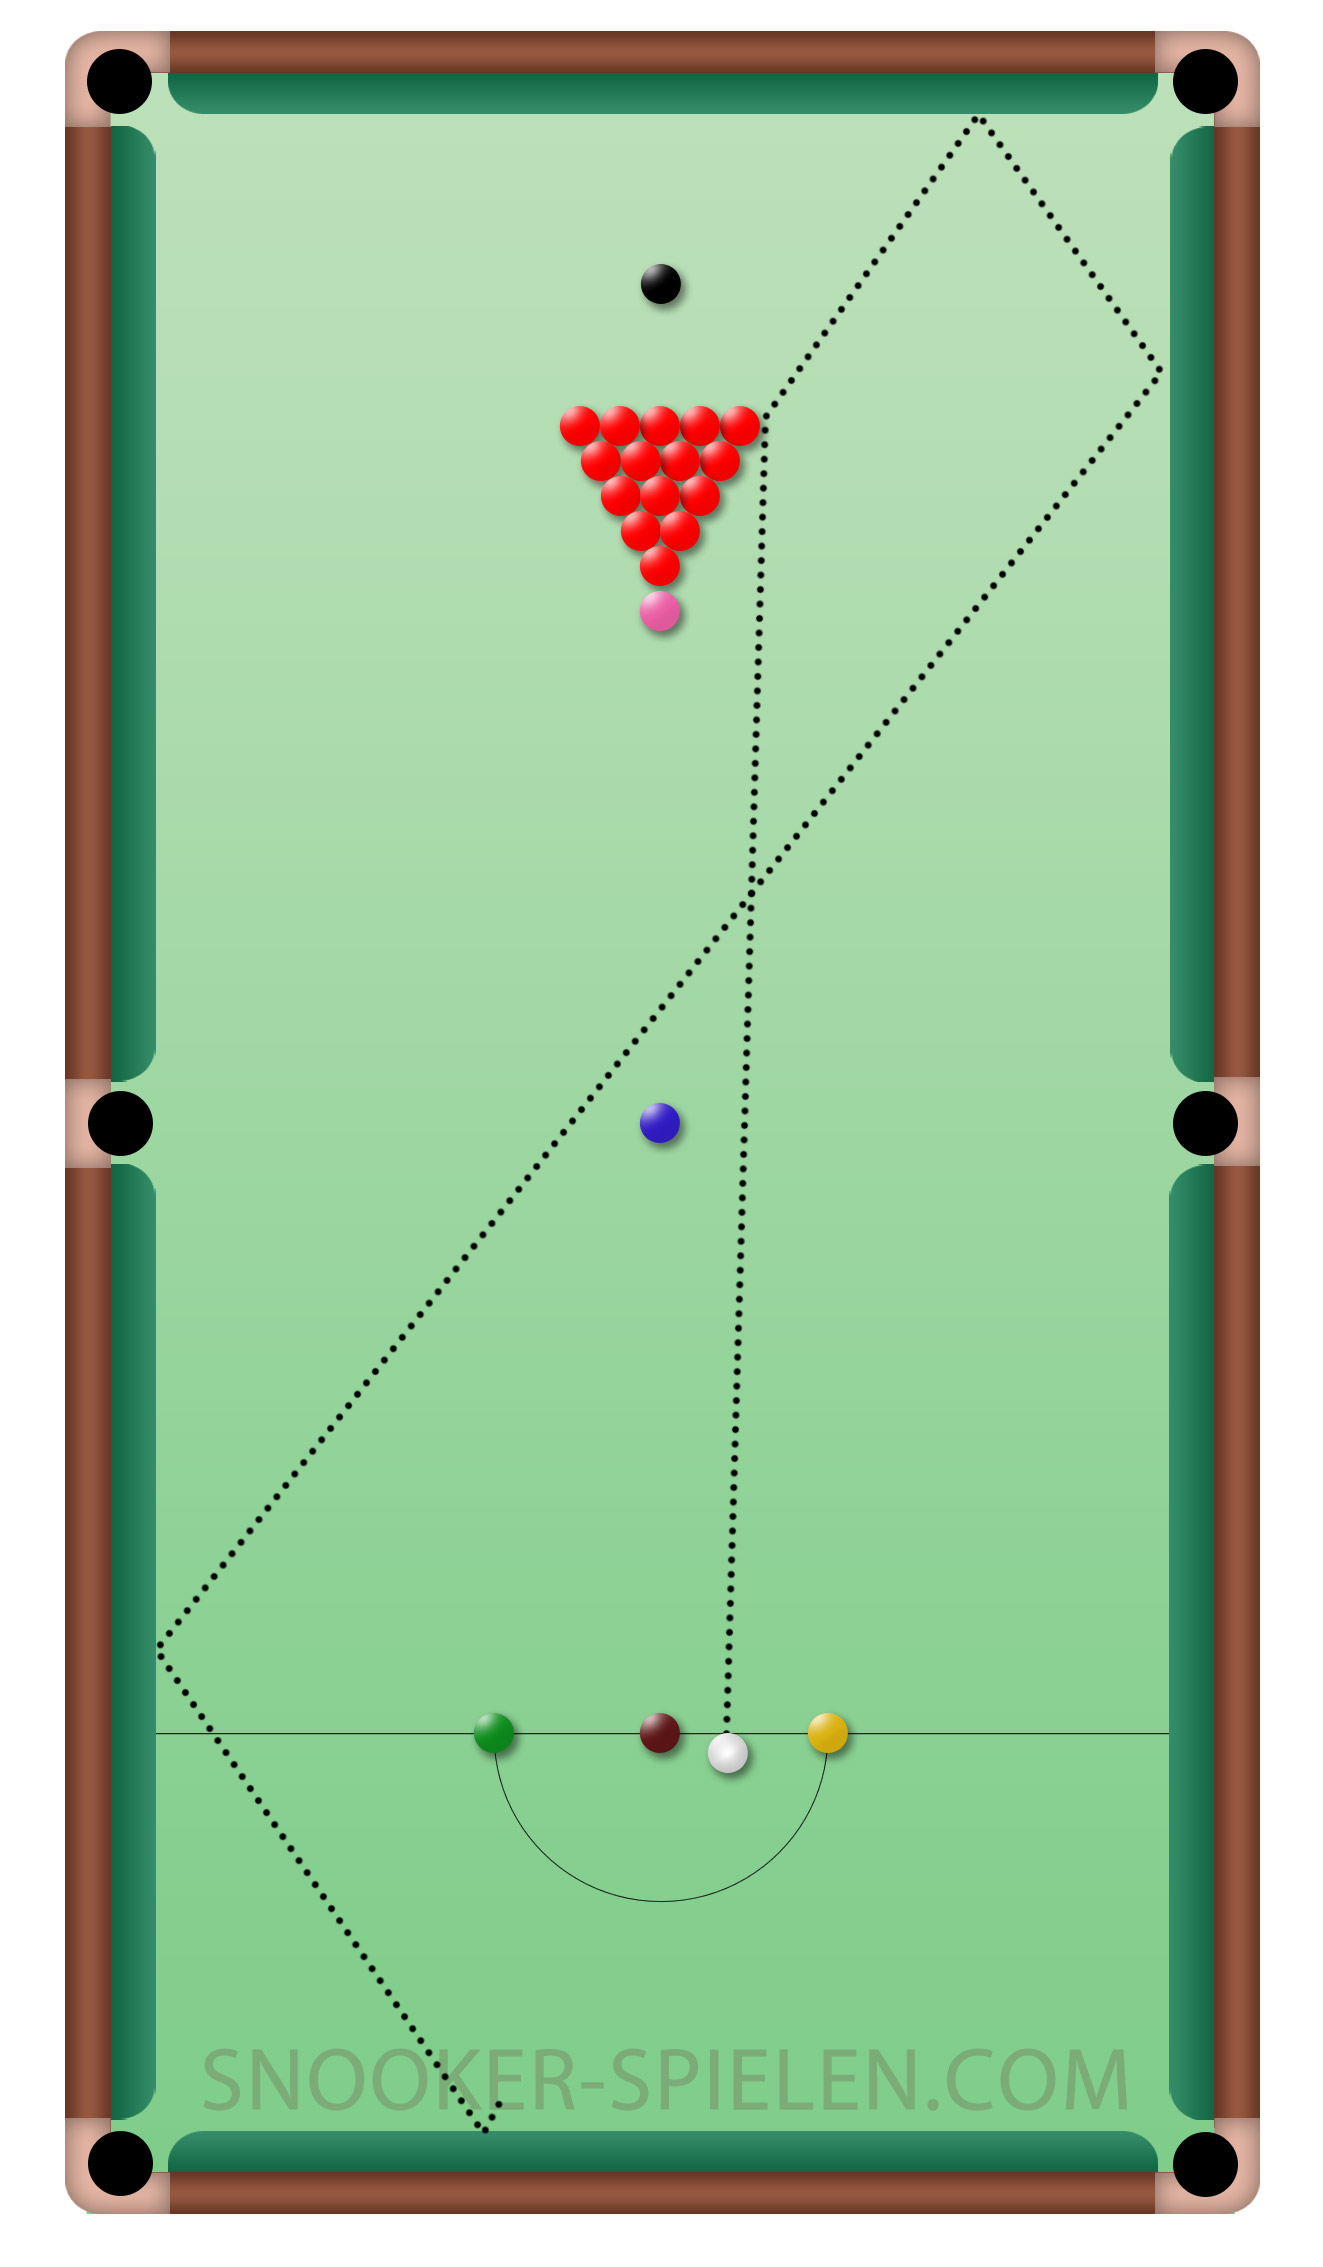 Regeln Snooker